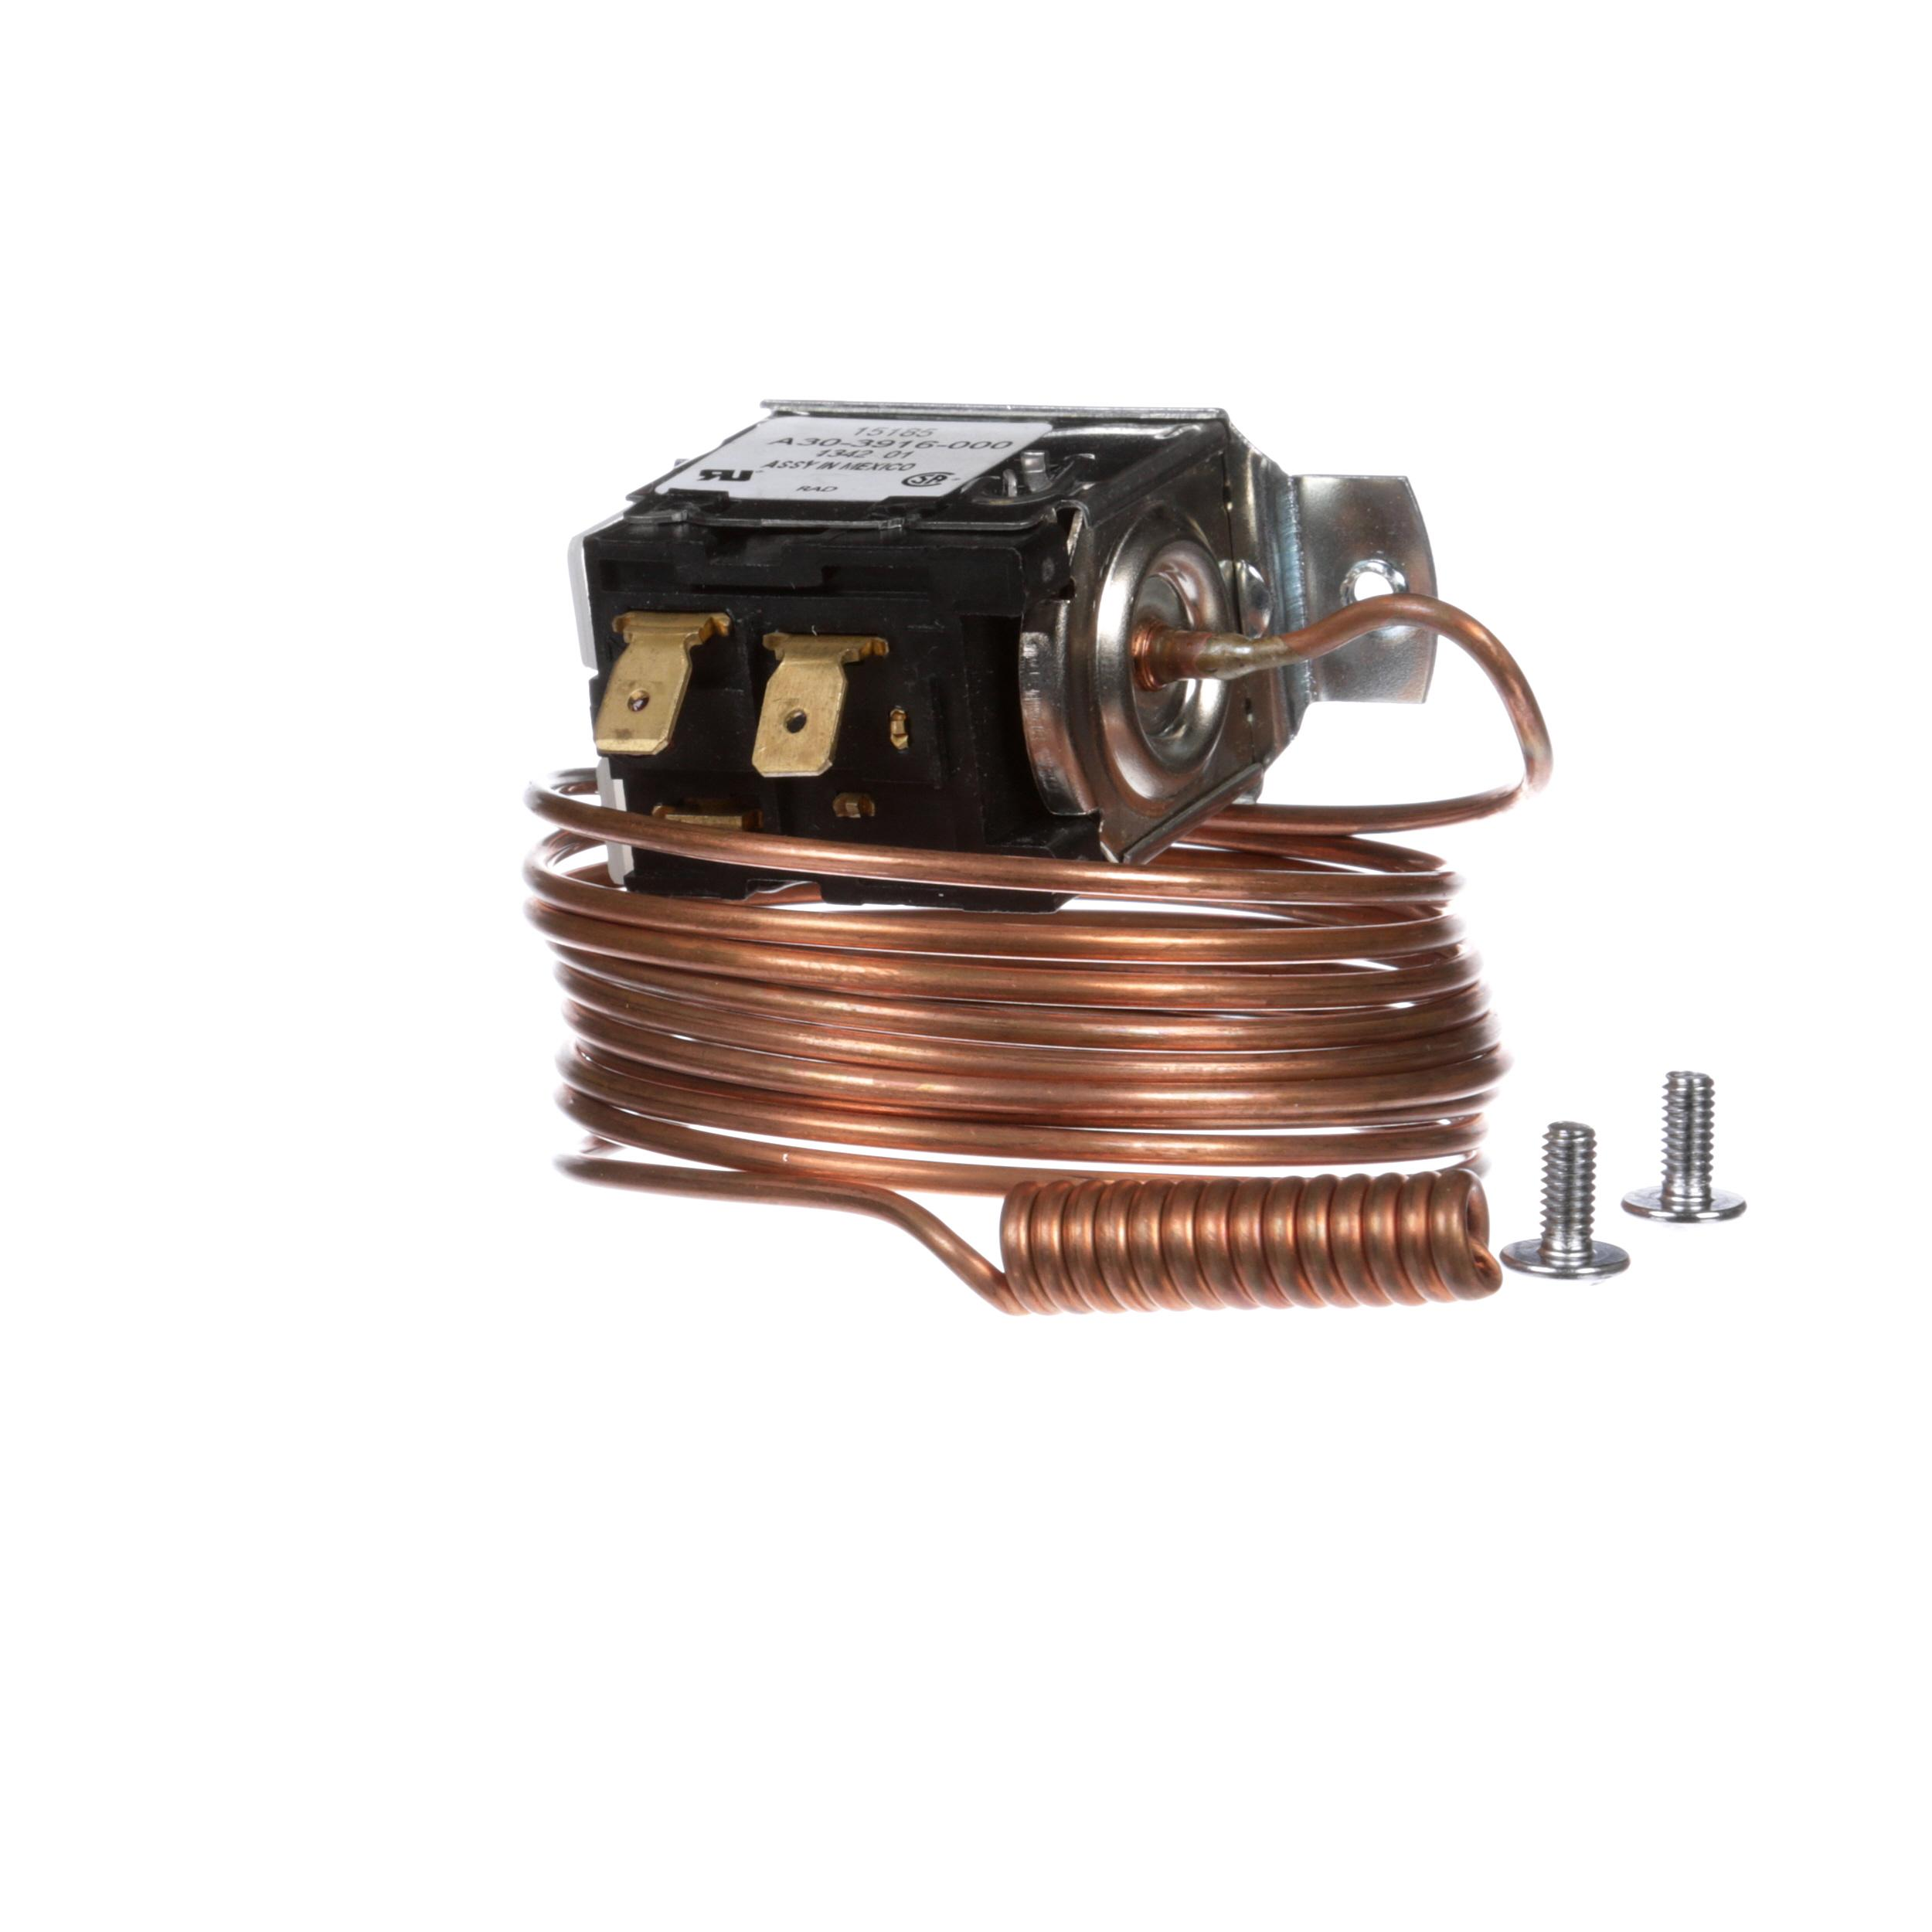 Mccall Controltemp Ranco Part Mcc15185 Controllers Temperature Controller